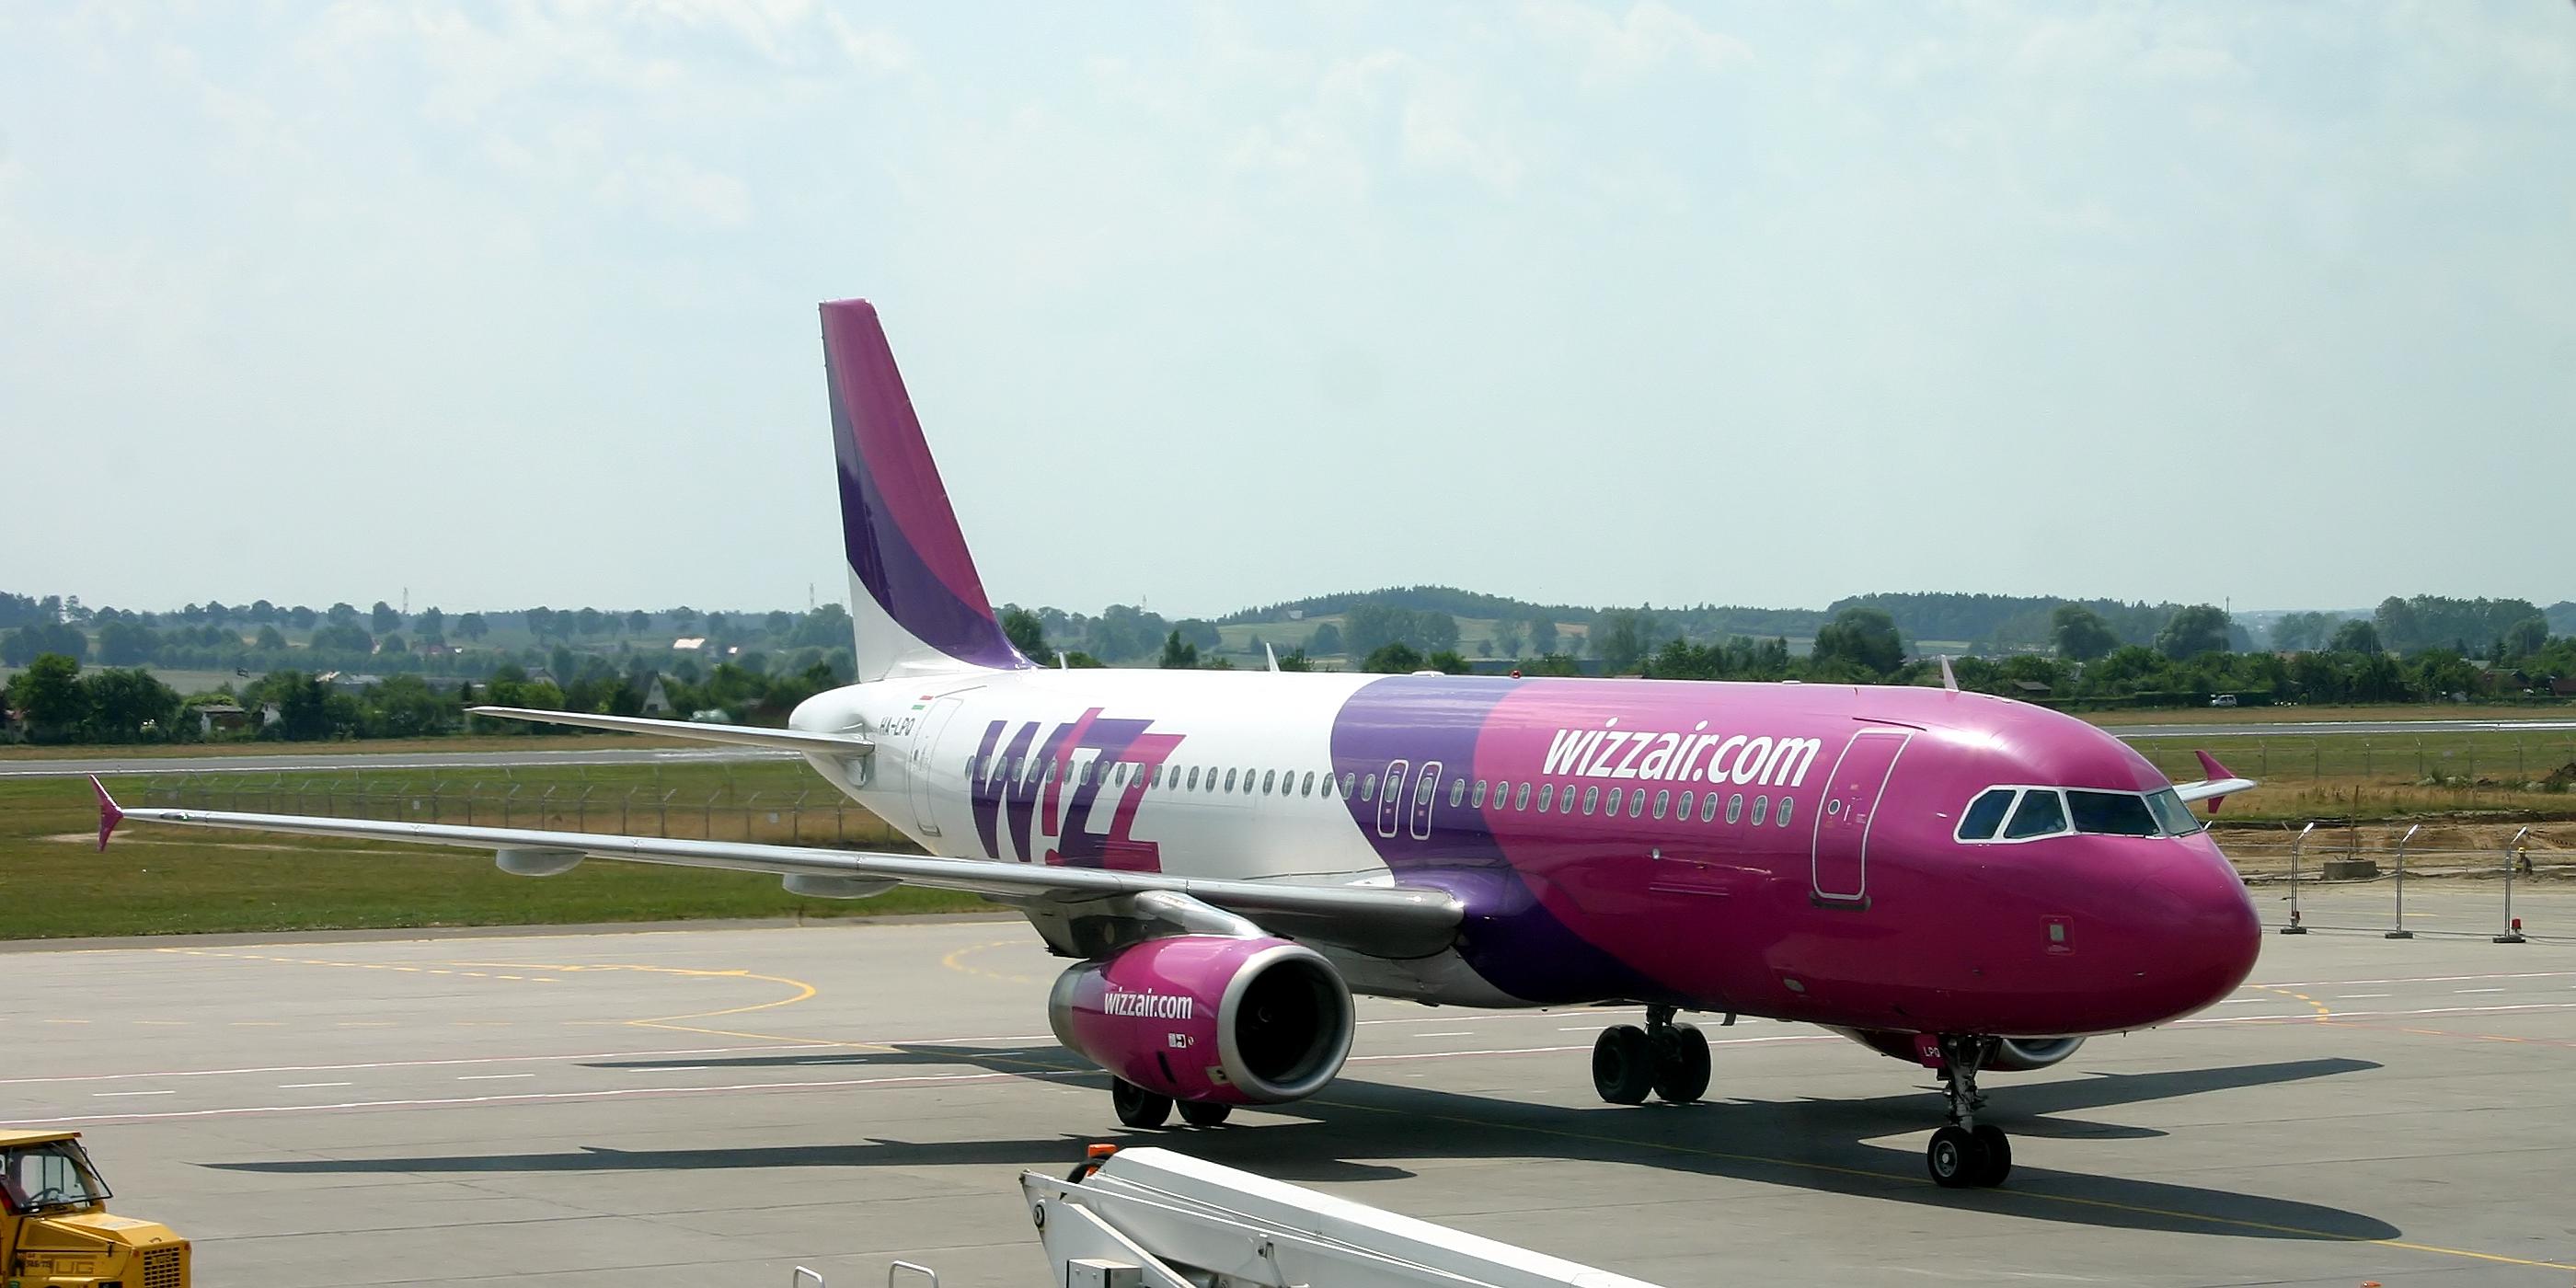 File:Wizzair - Airbus A320-232 - Gdansk - HA-LPQ (3884